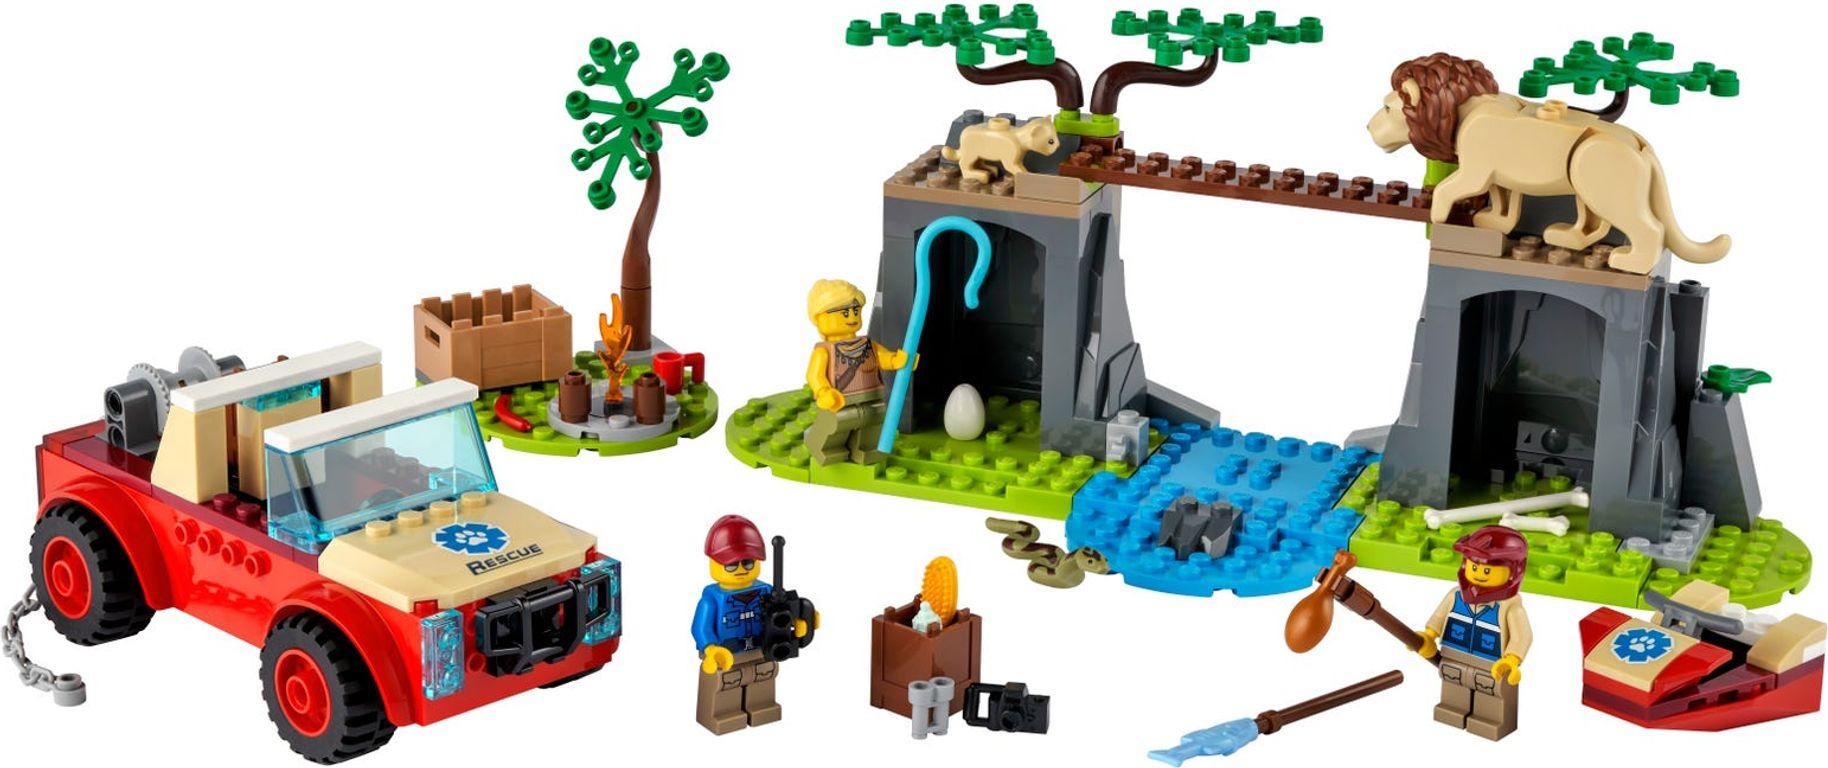 LEGO® City Wildlife Rescue Off-Roader components